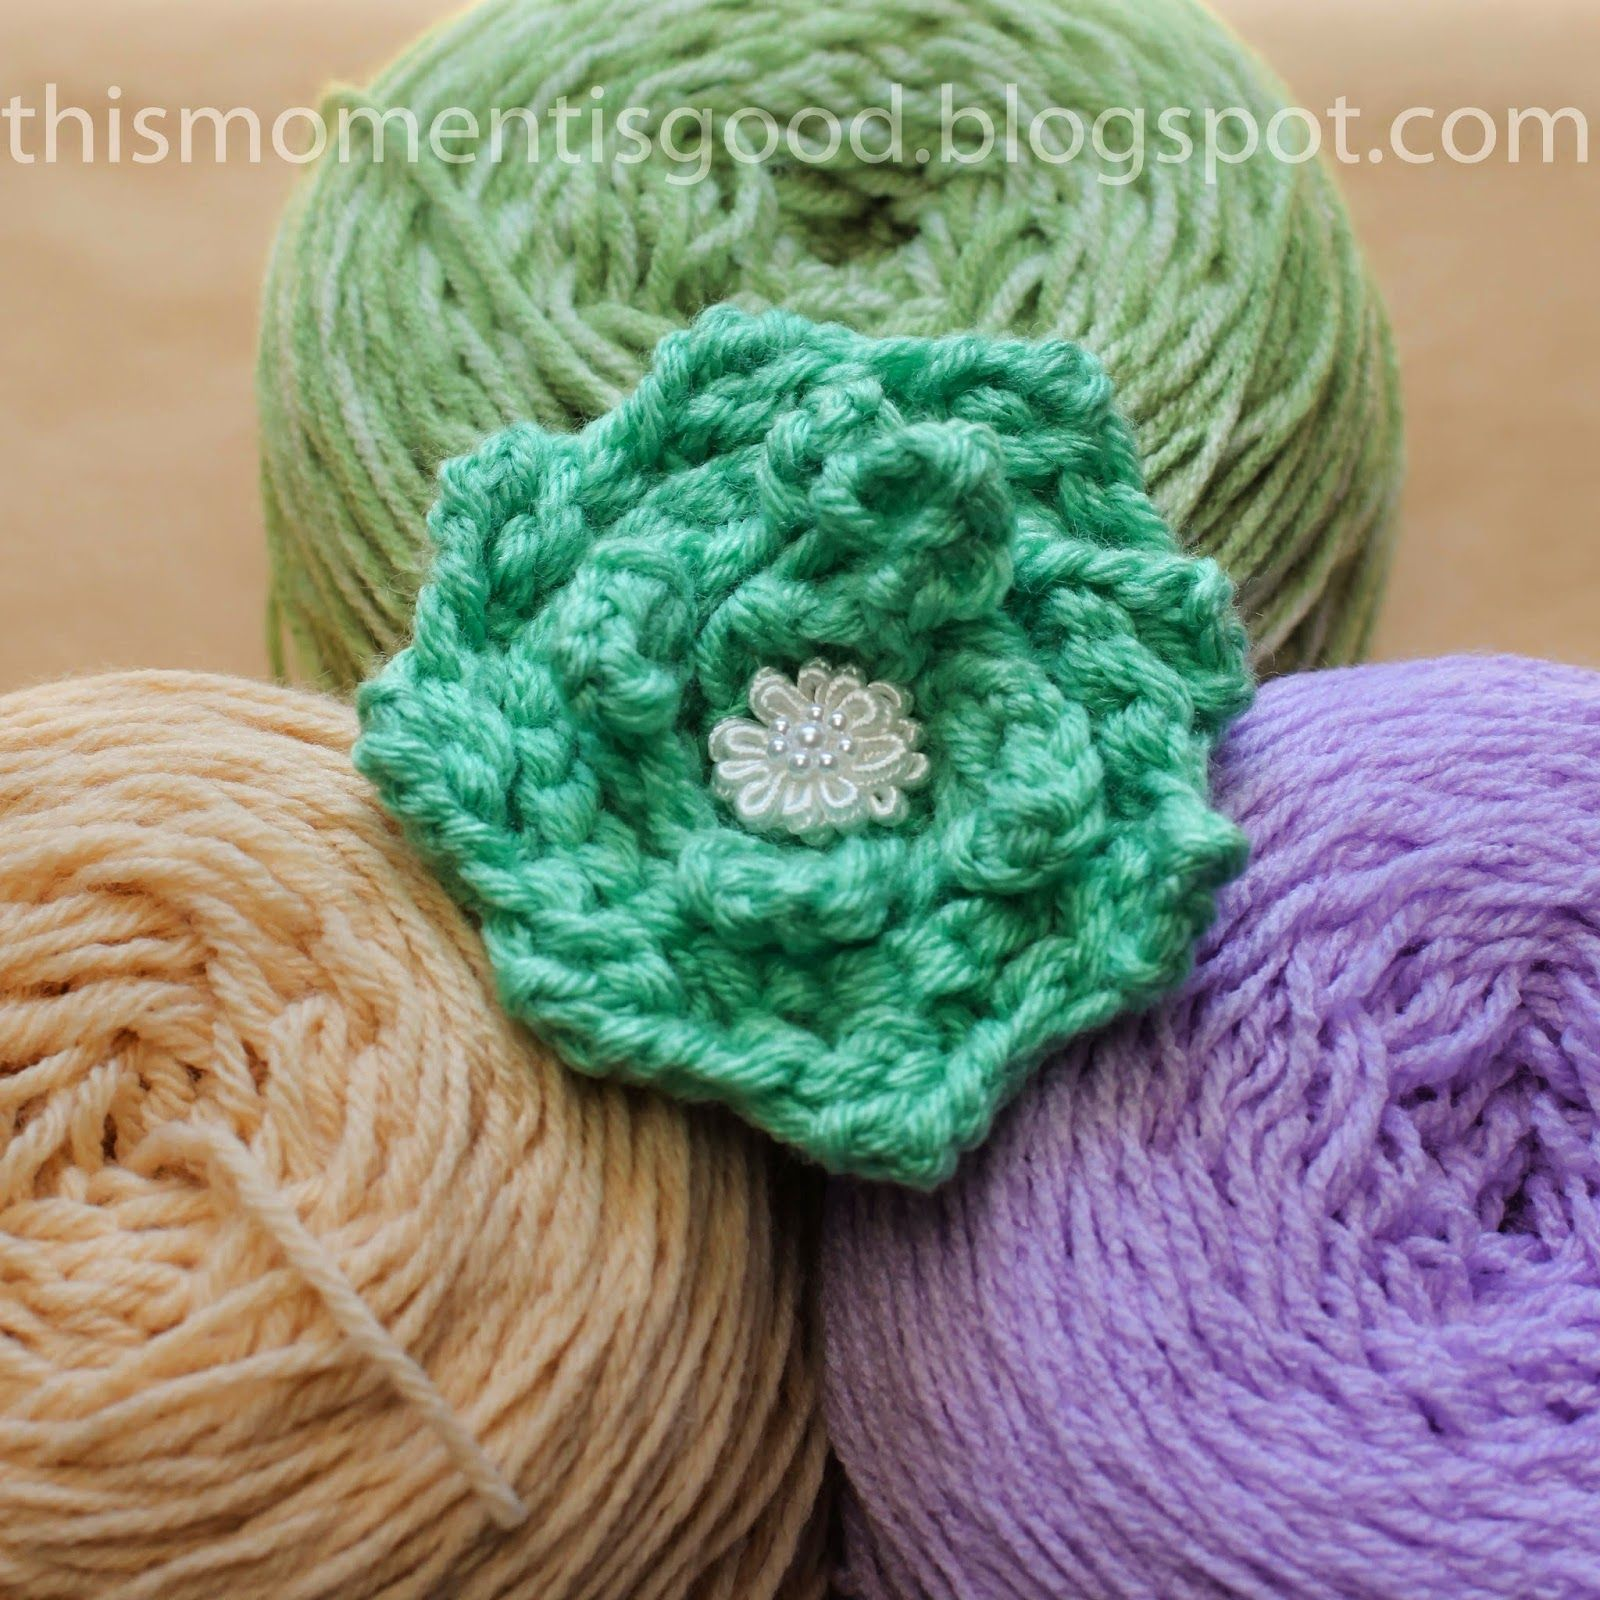 LOOM KNIT ROSE PATTERN | Loom knitting, Loom knitting patterns and ...